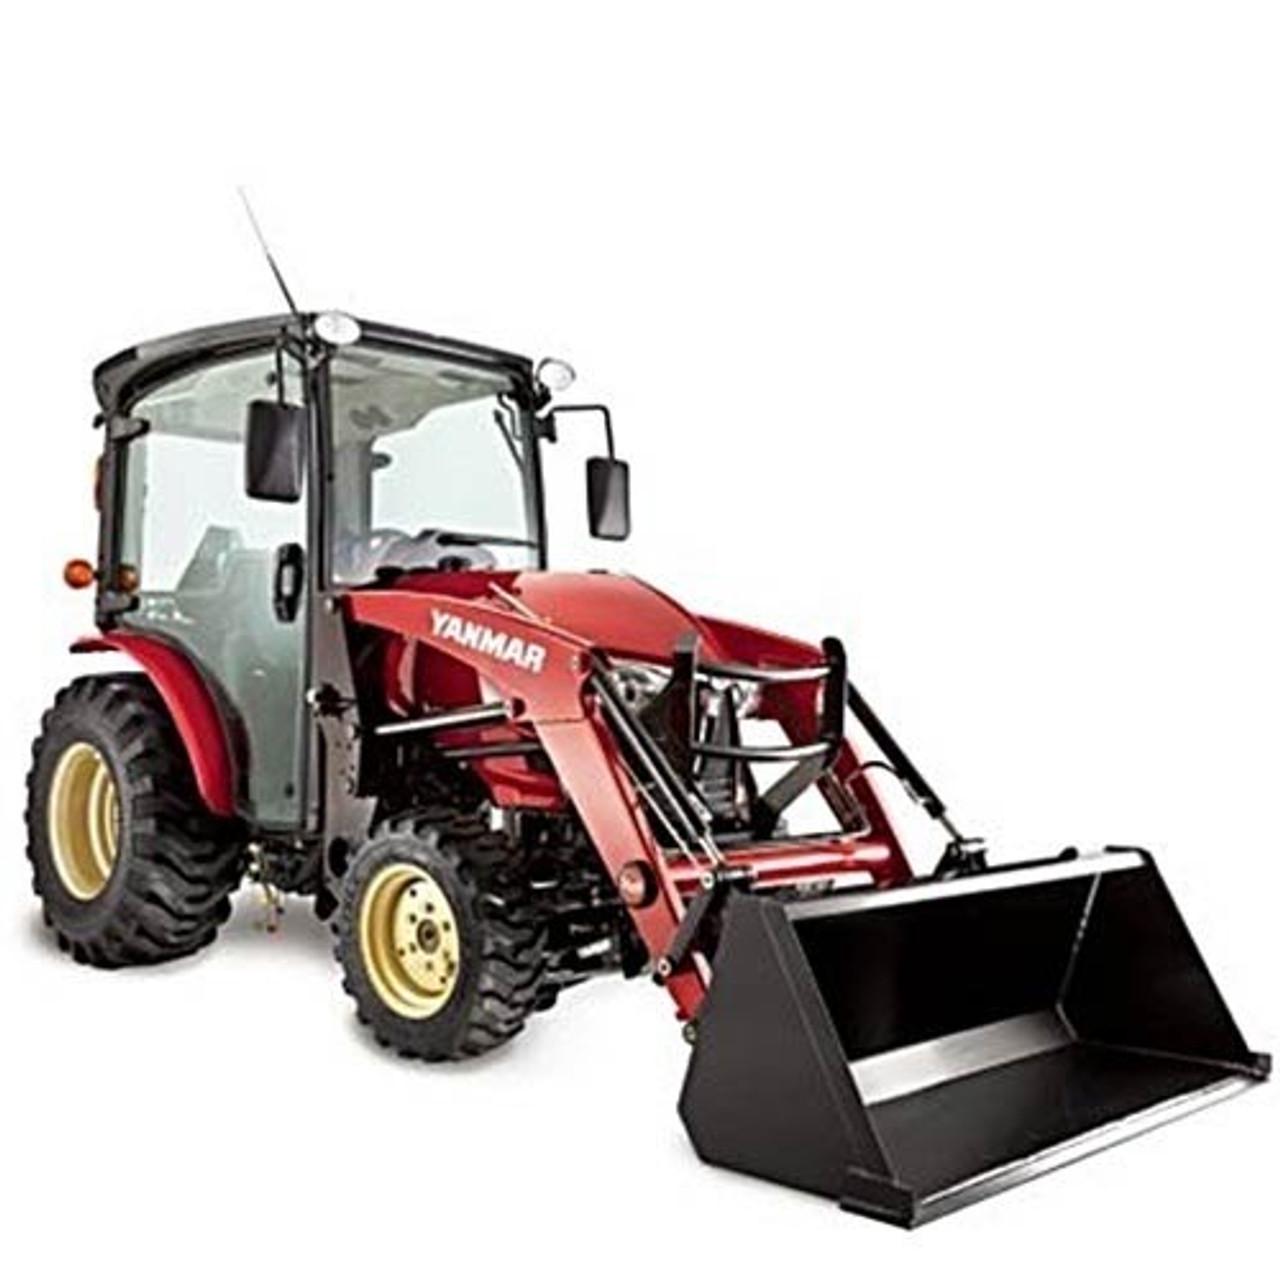 Tractor - Loader